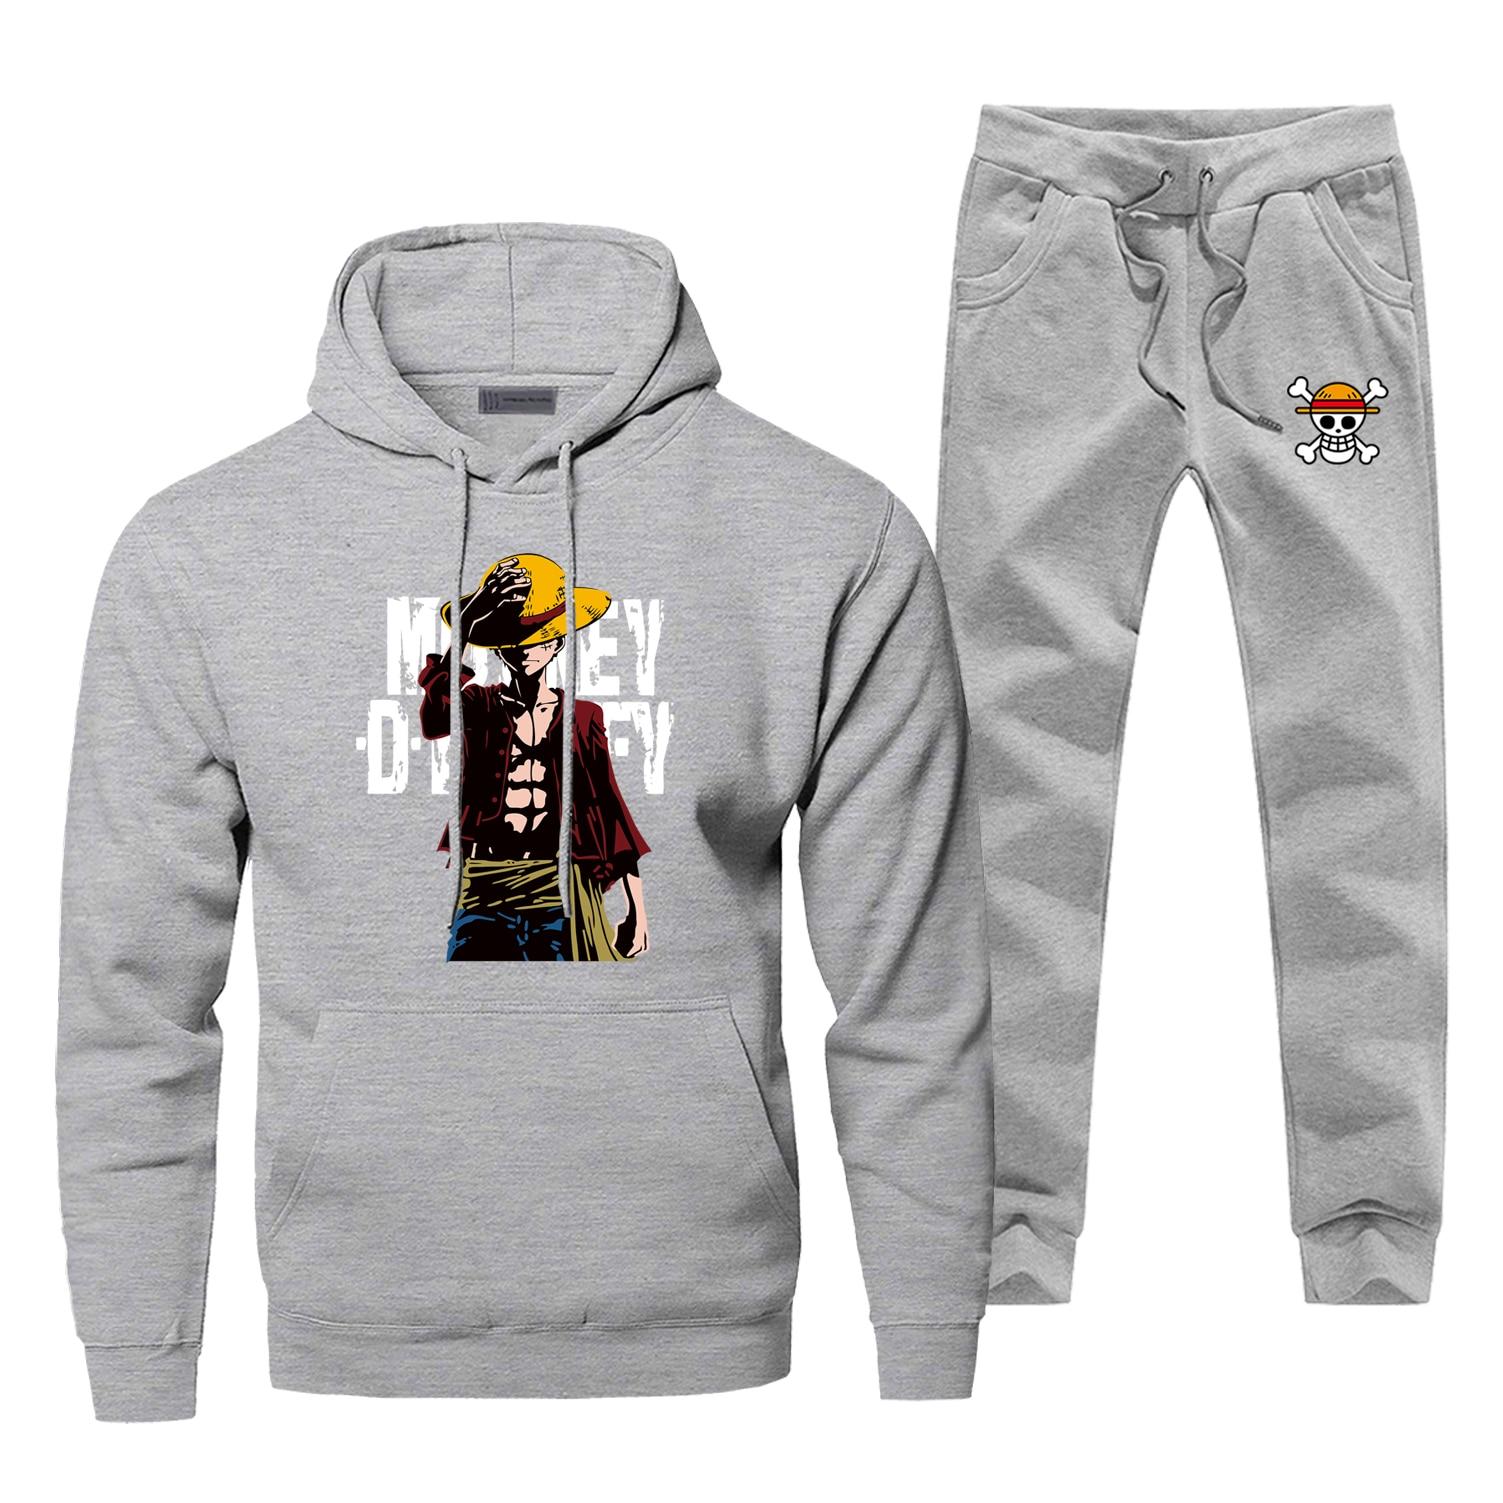 Mens Hoodies One Piece Luffy Sets Two Piece Pant Japanese Anime Hoodie Sweatshirt Sweatpants Streetwear Sportswear Sweatshirts